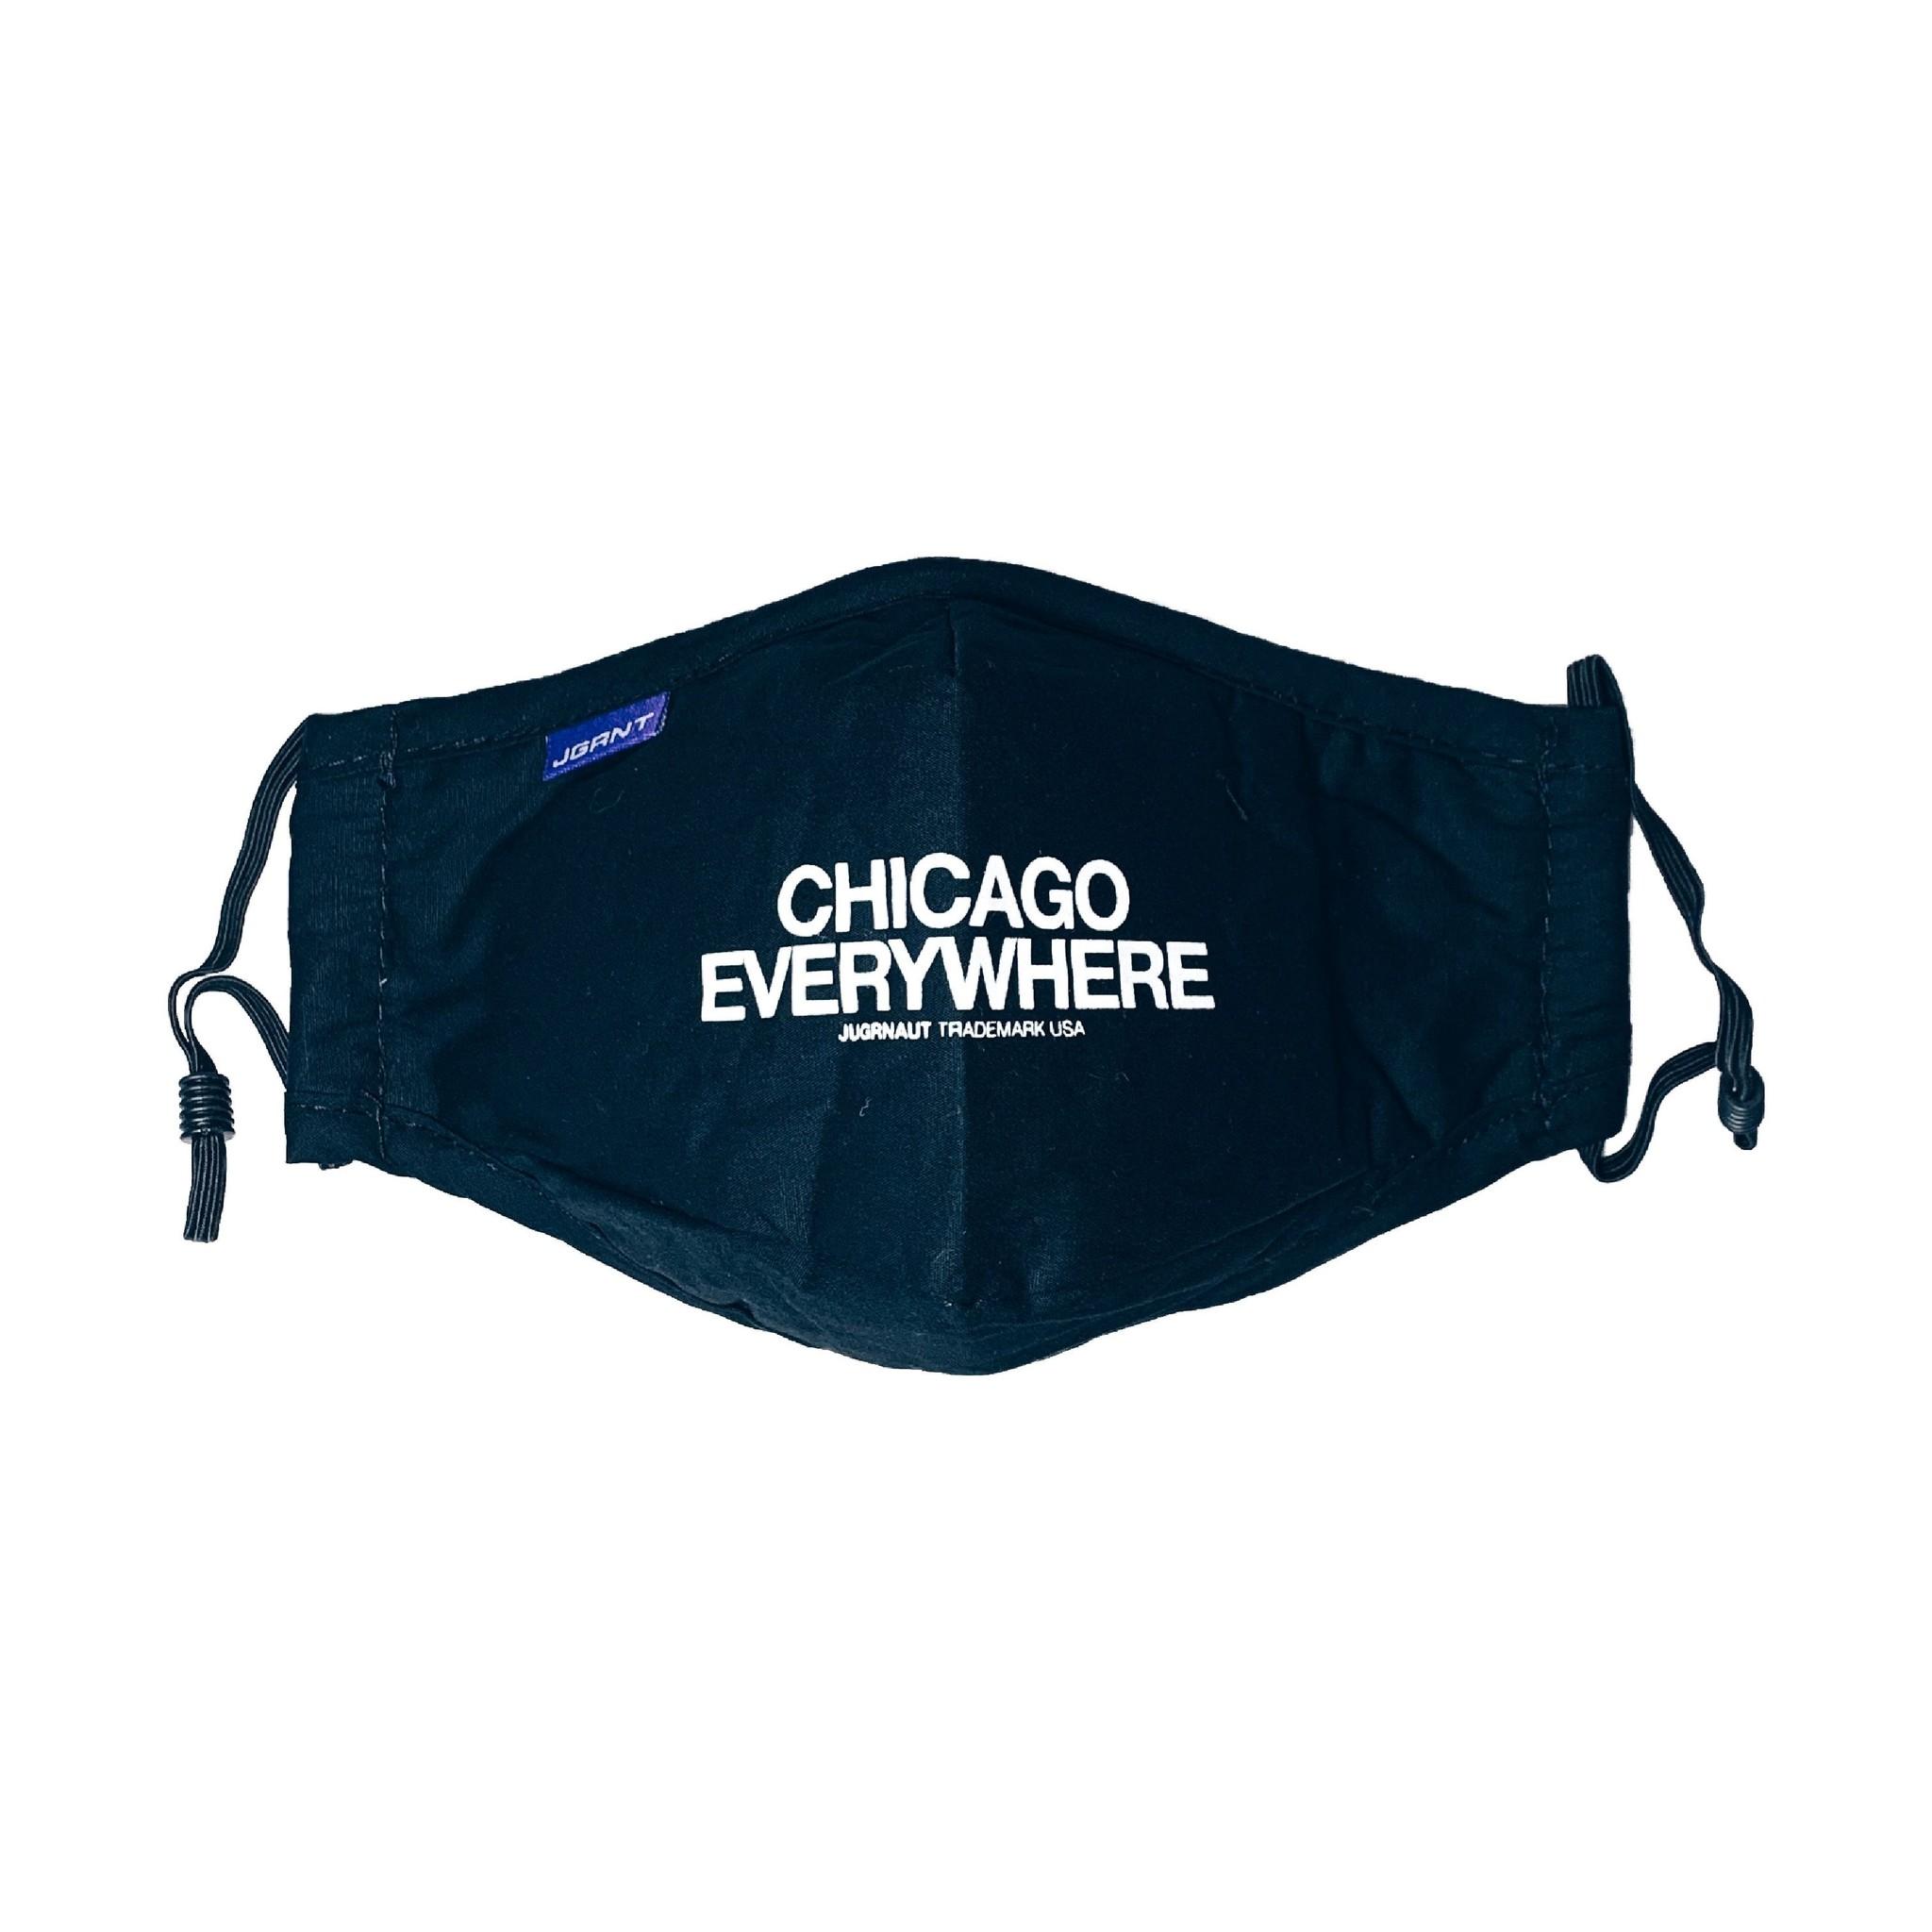 Jugrnaut Jugrnaut Chicago Everywhere face mask Black